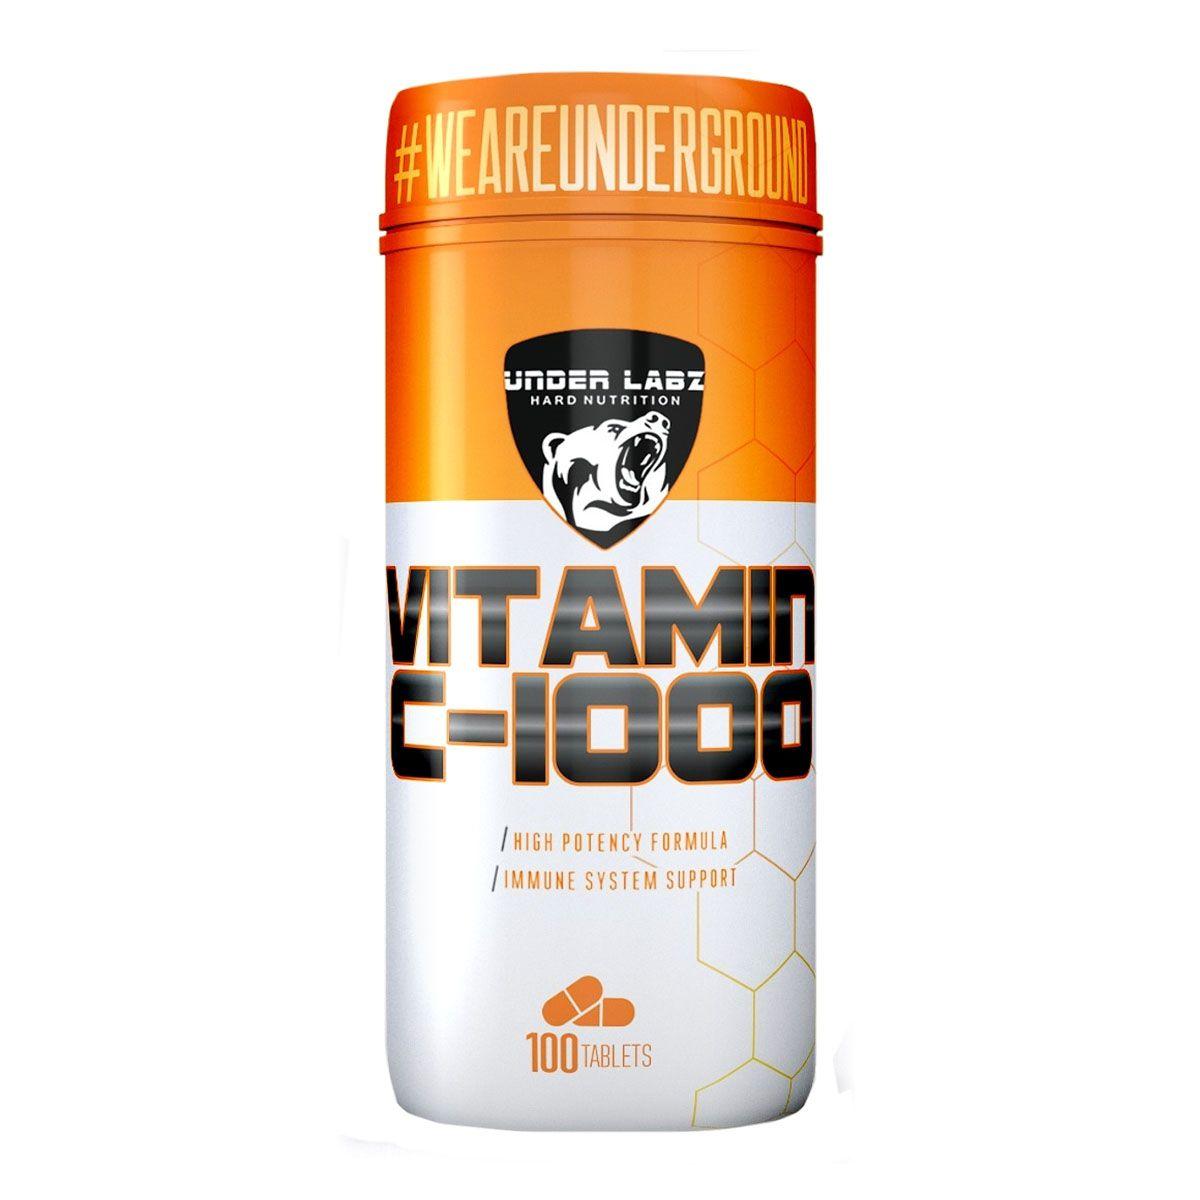 Vitamin C 1000 120 Tabletes - Under Labz